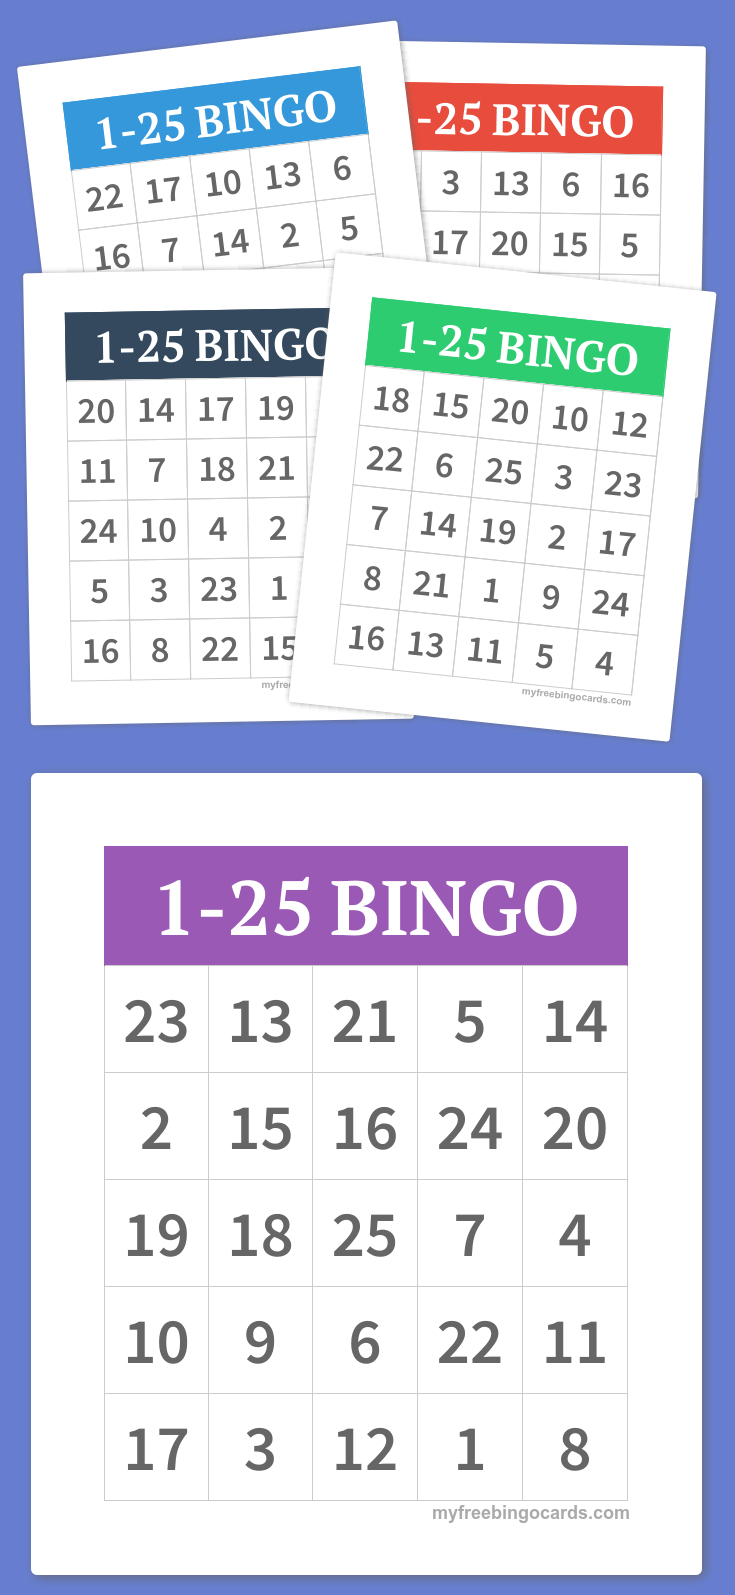 Free Printable Bingo Cards | Bingo Cards Printable, Free